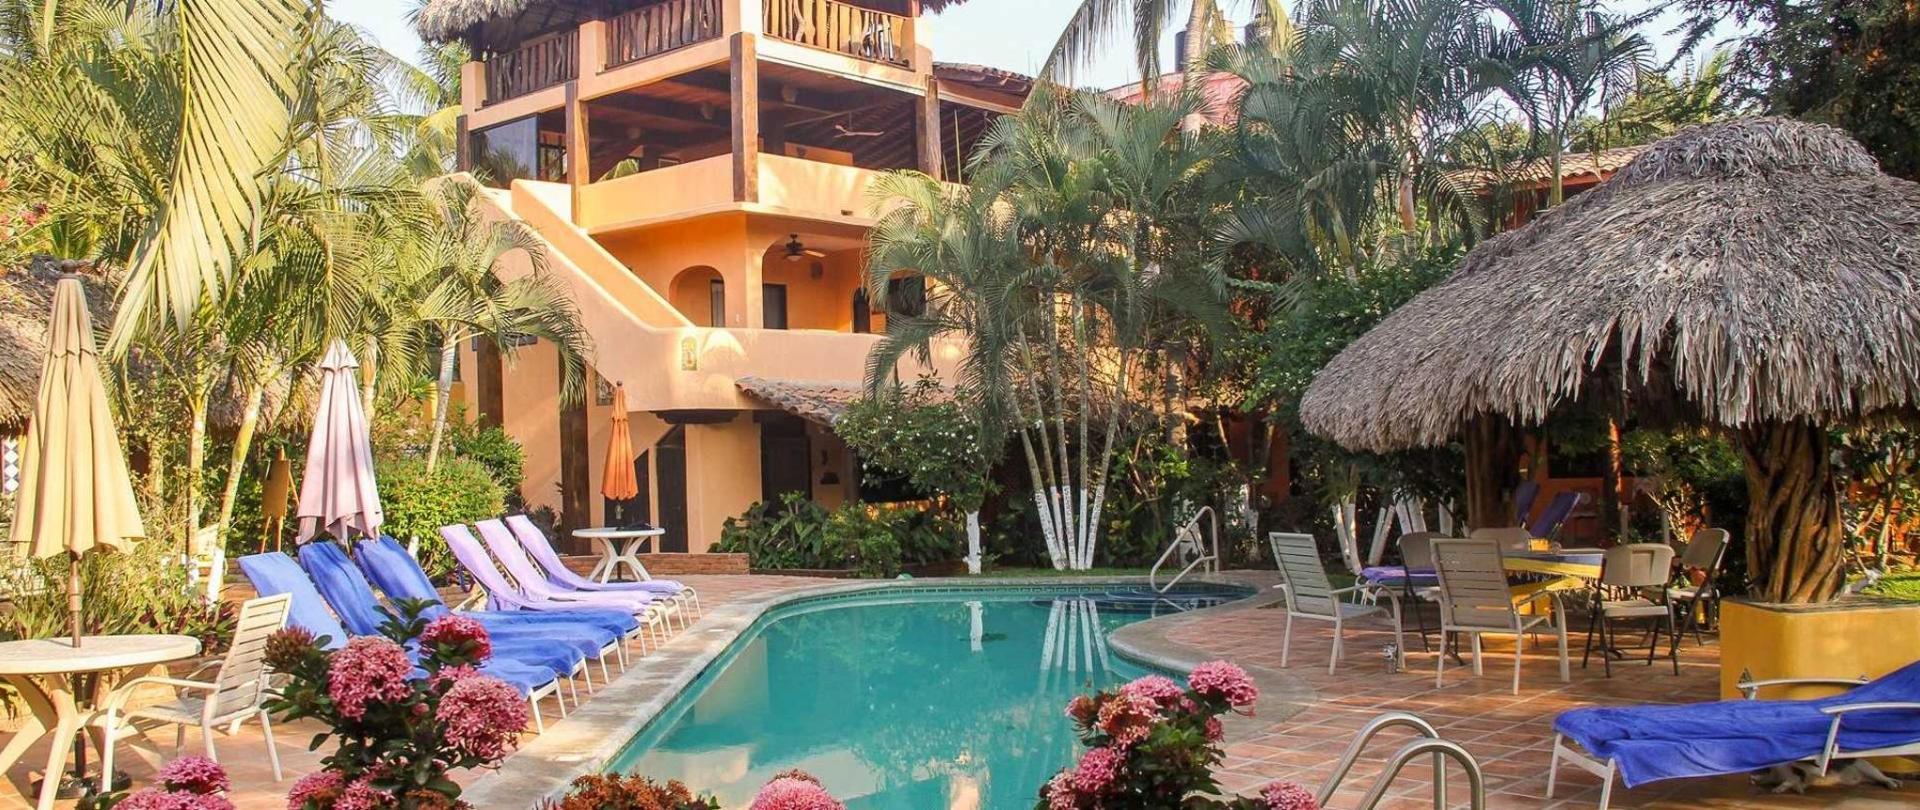 Hotel Casamar Suites